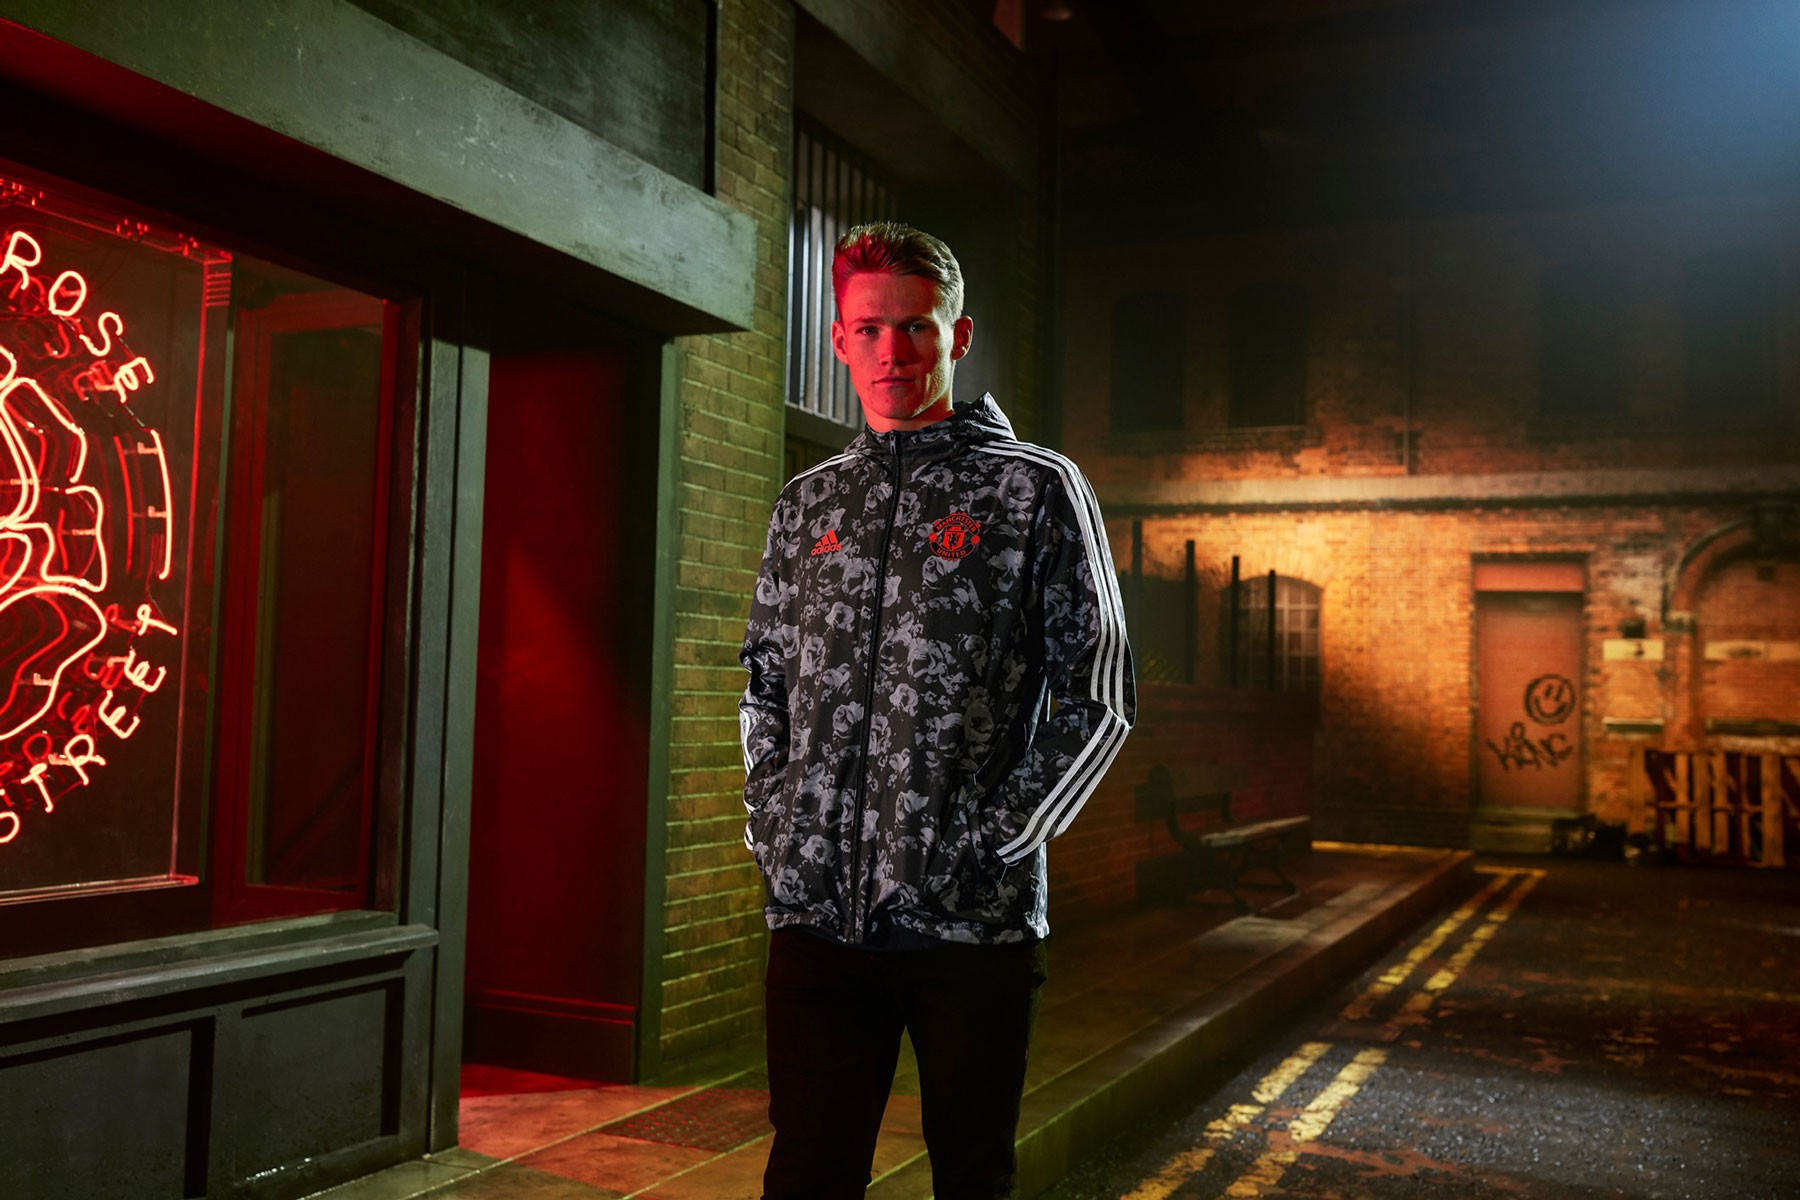 Manchester United x adidas UltraBOOST